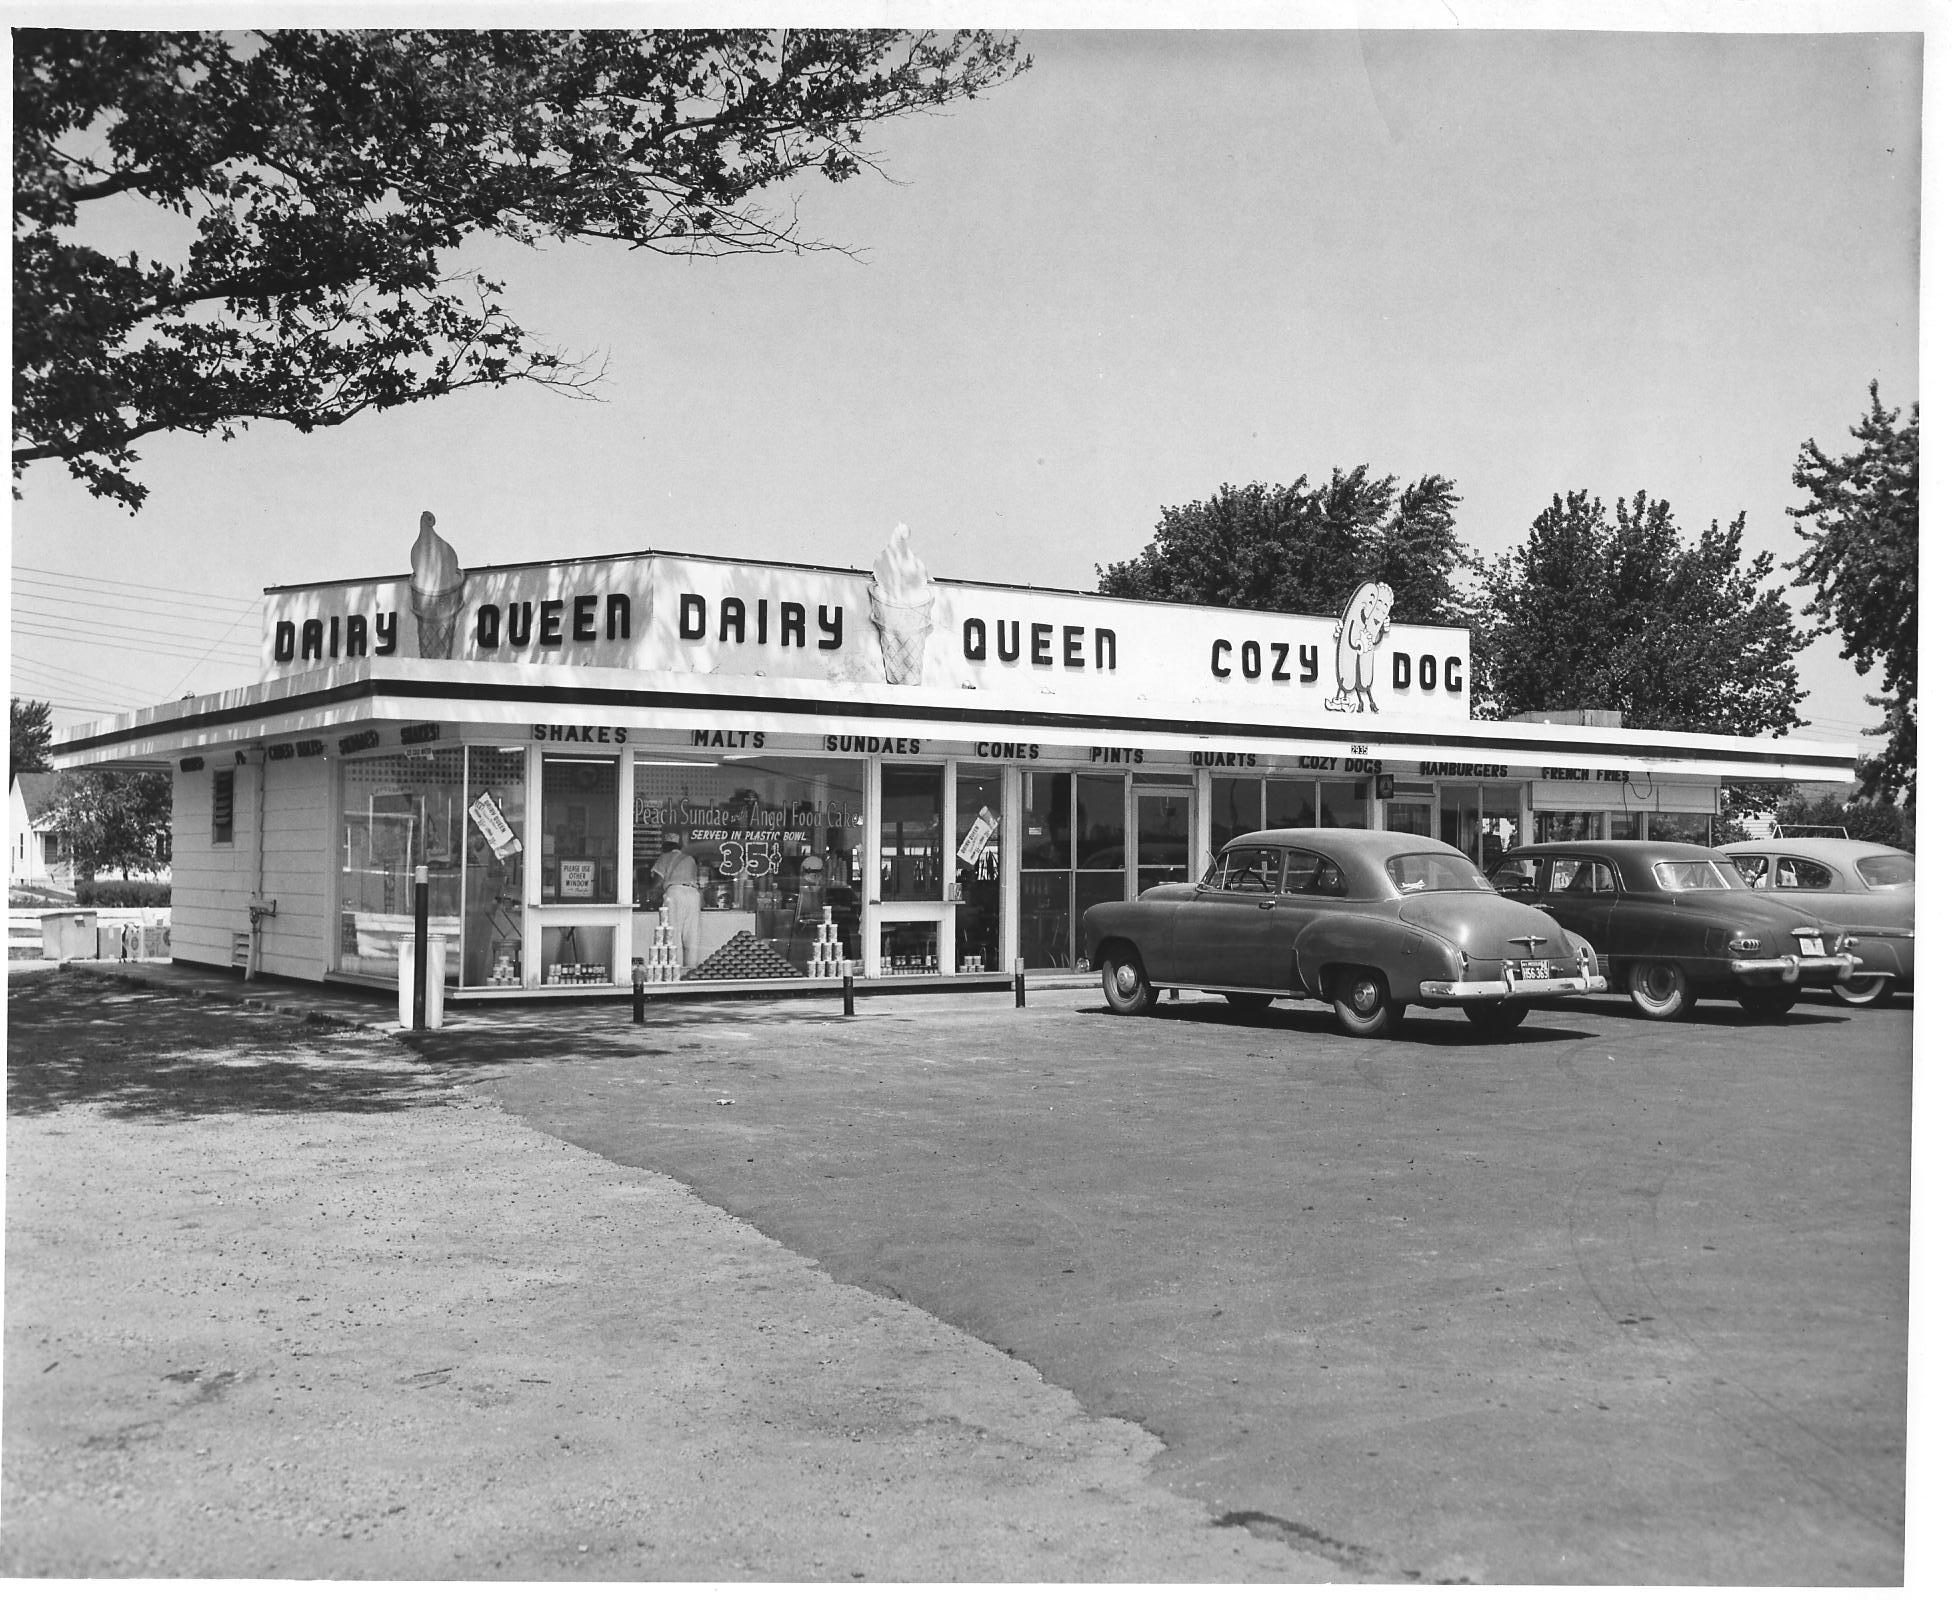 Cozy Dog Drive In. Original Location South Sixth Street.